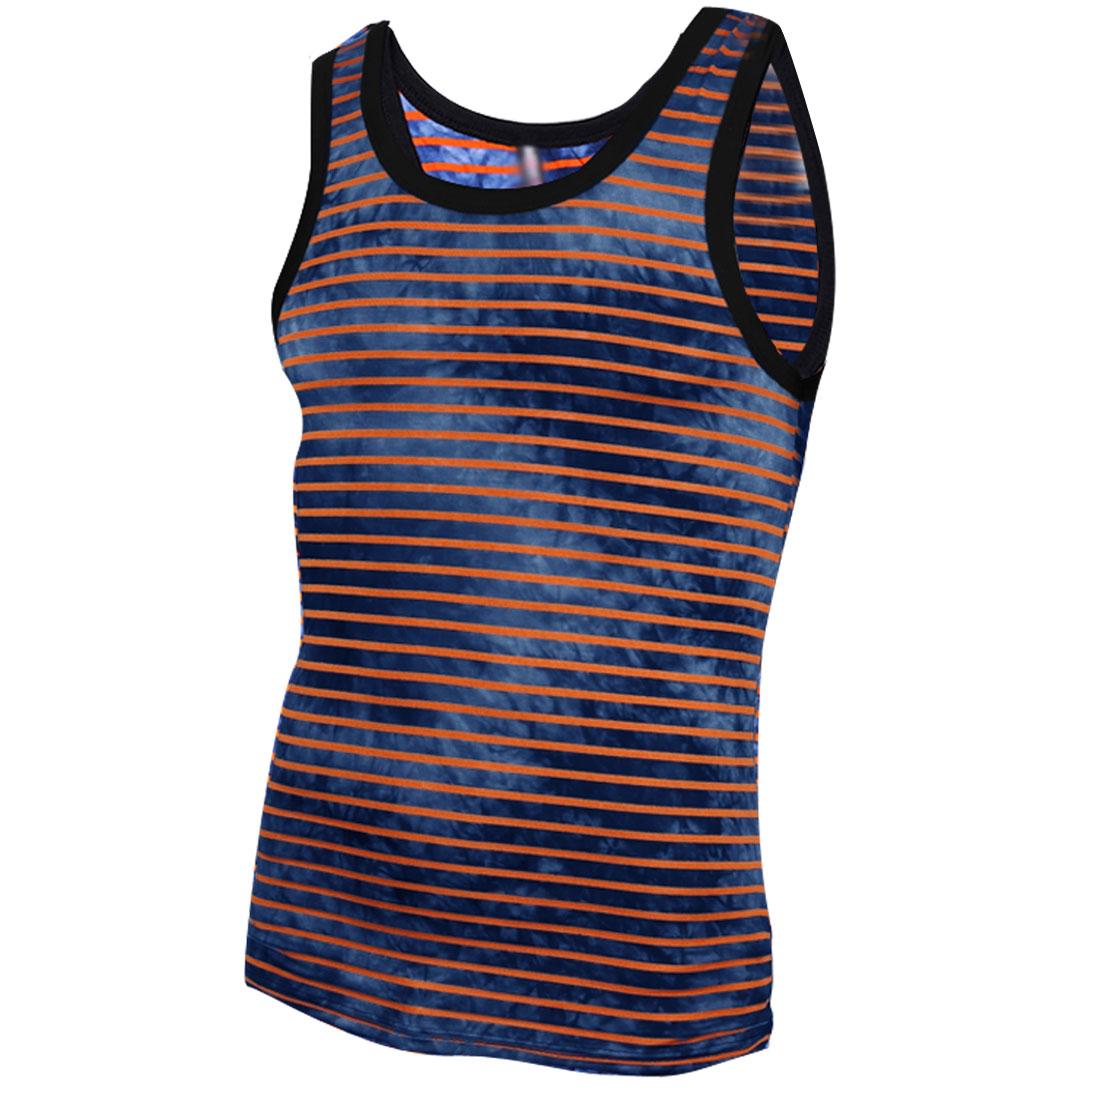 Men U Neck Sleeveless Stripes Summer Wearing Tank Top Brick Navy Blue S